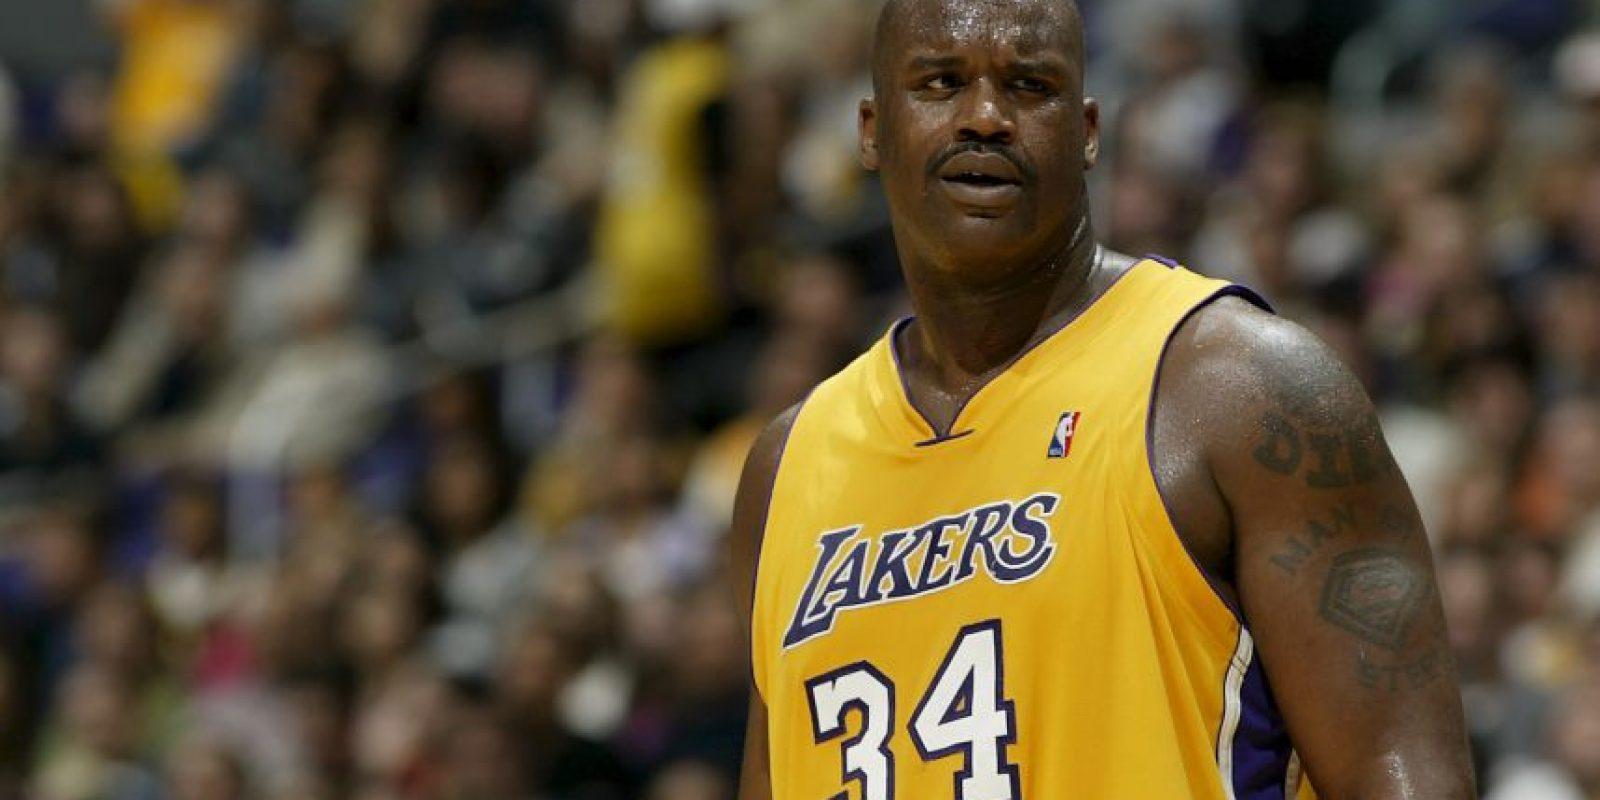 Se retiró del baloncesto en 2011. Foto:Getty Images